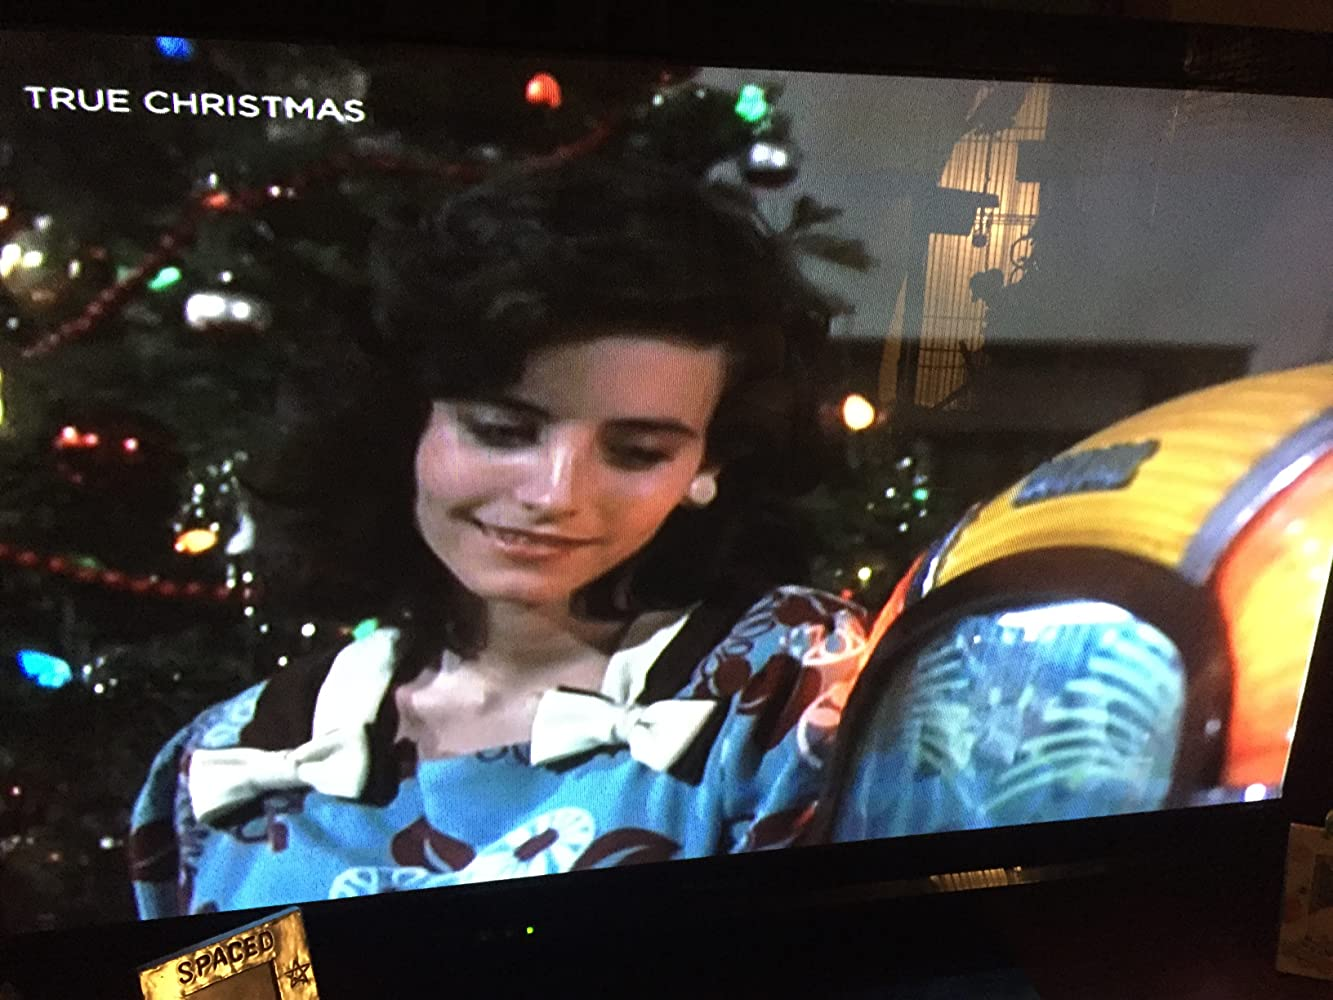 I Ll Be Home For Christmas 1988.I Ll Be Home For Christmas 1988